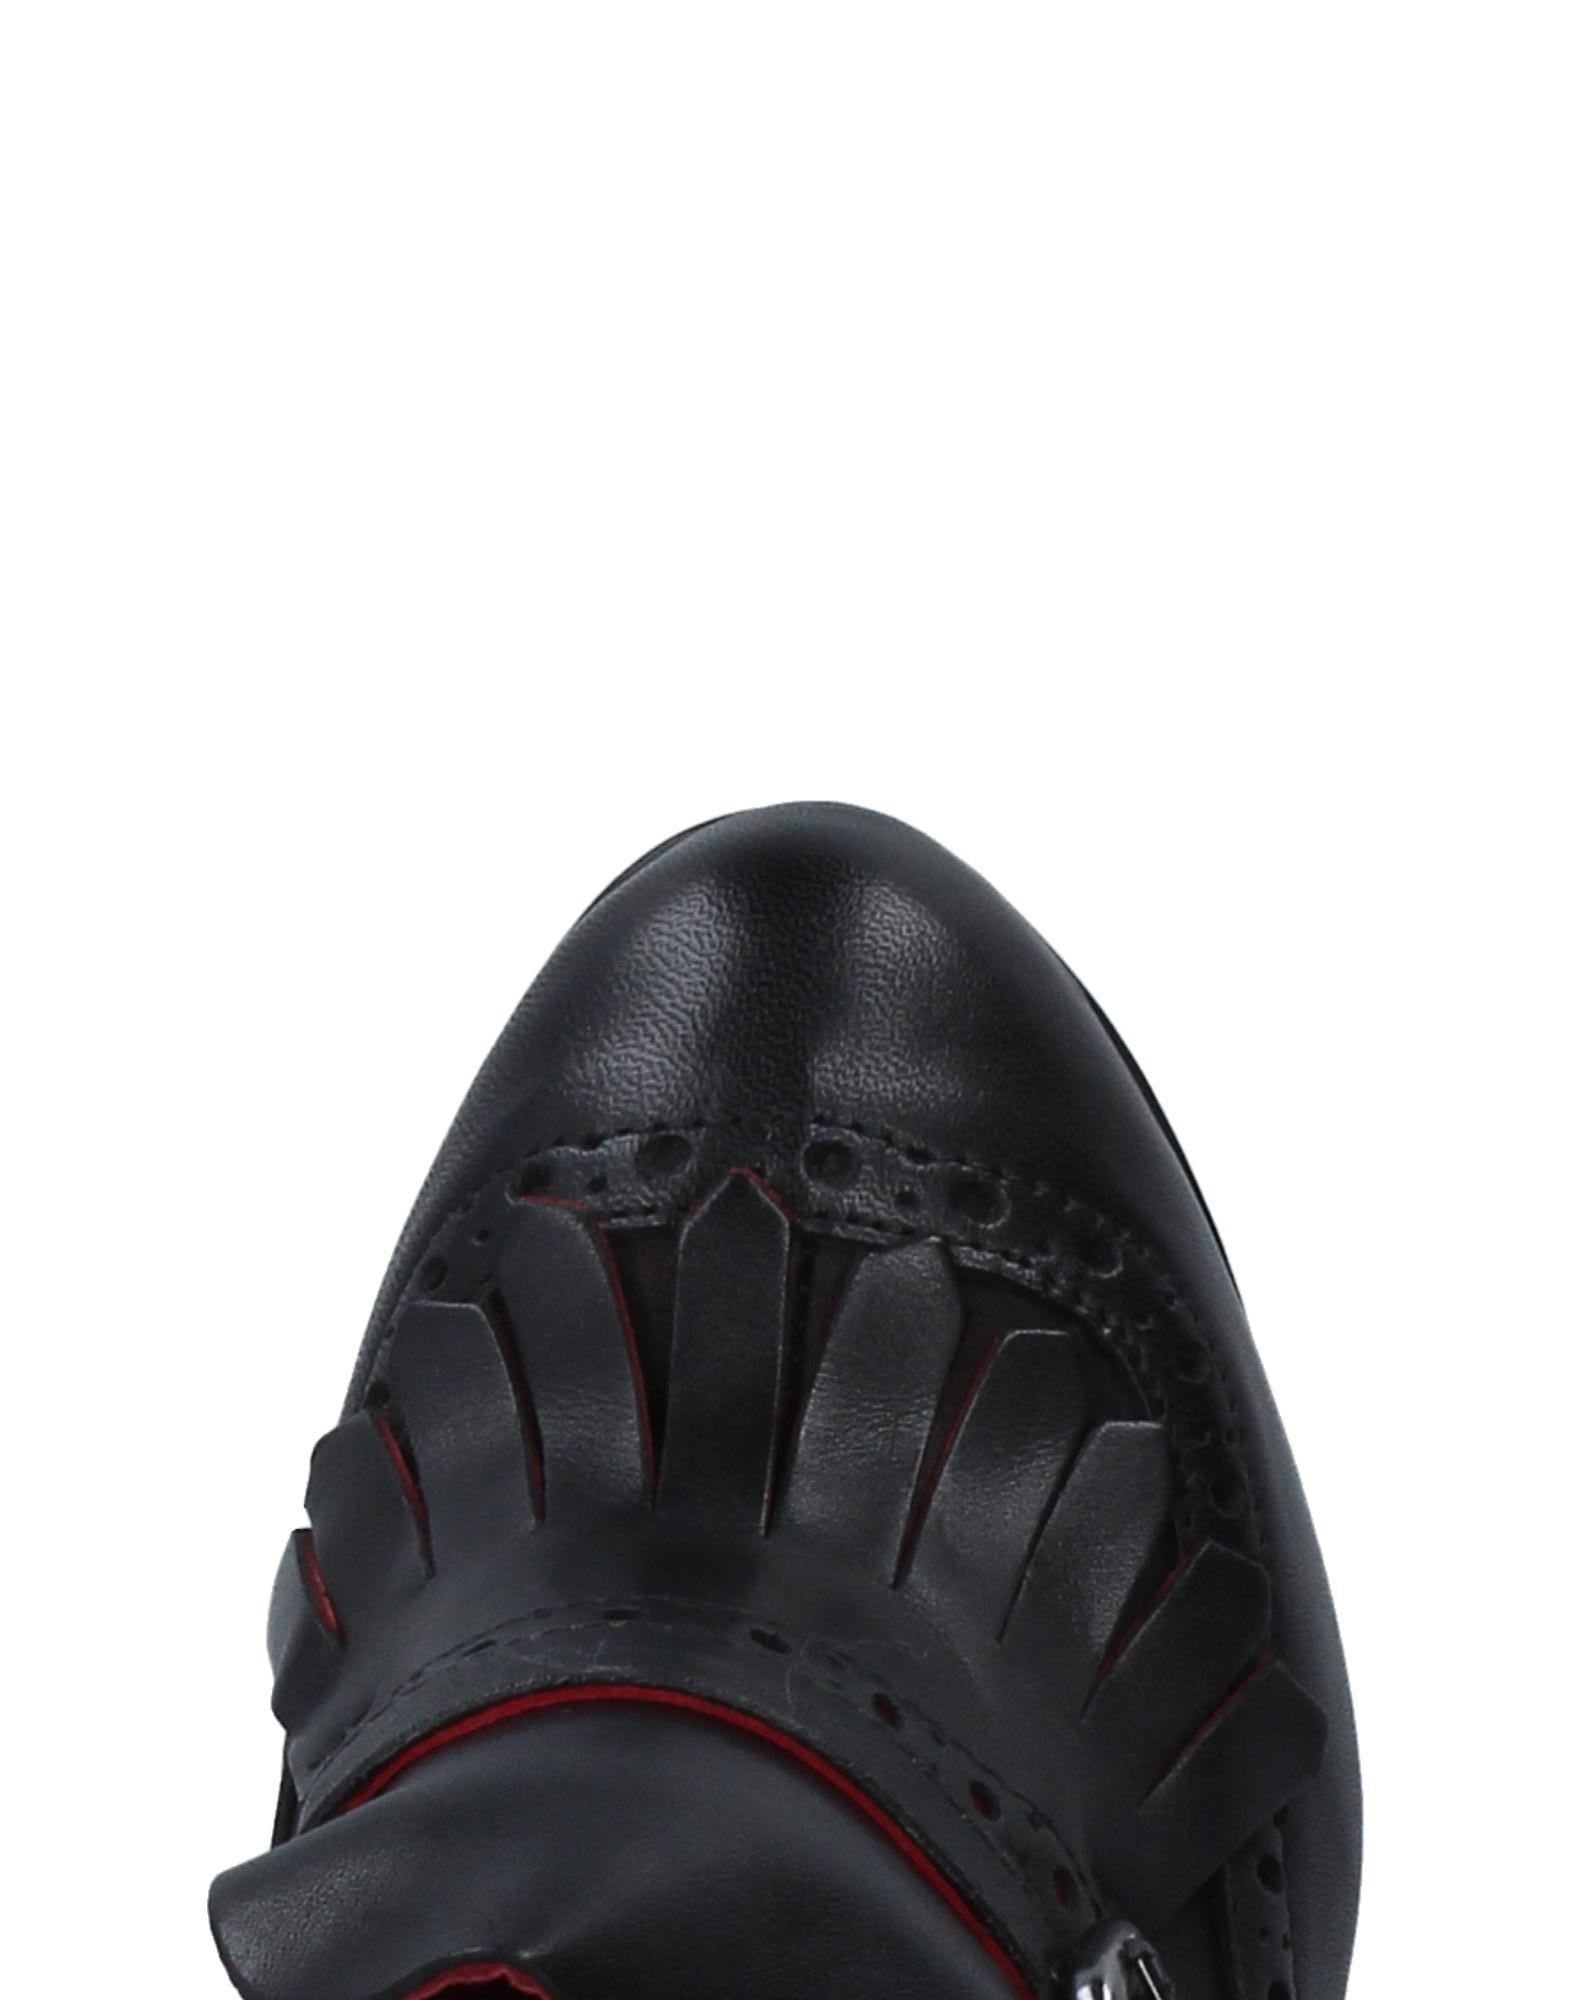 Brawn's Heiße Mokassins Damen  11265297TW Heiße Brawn's Schuhe fb926d